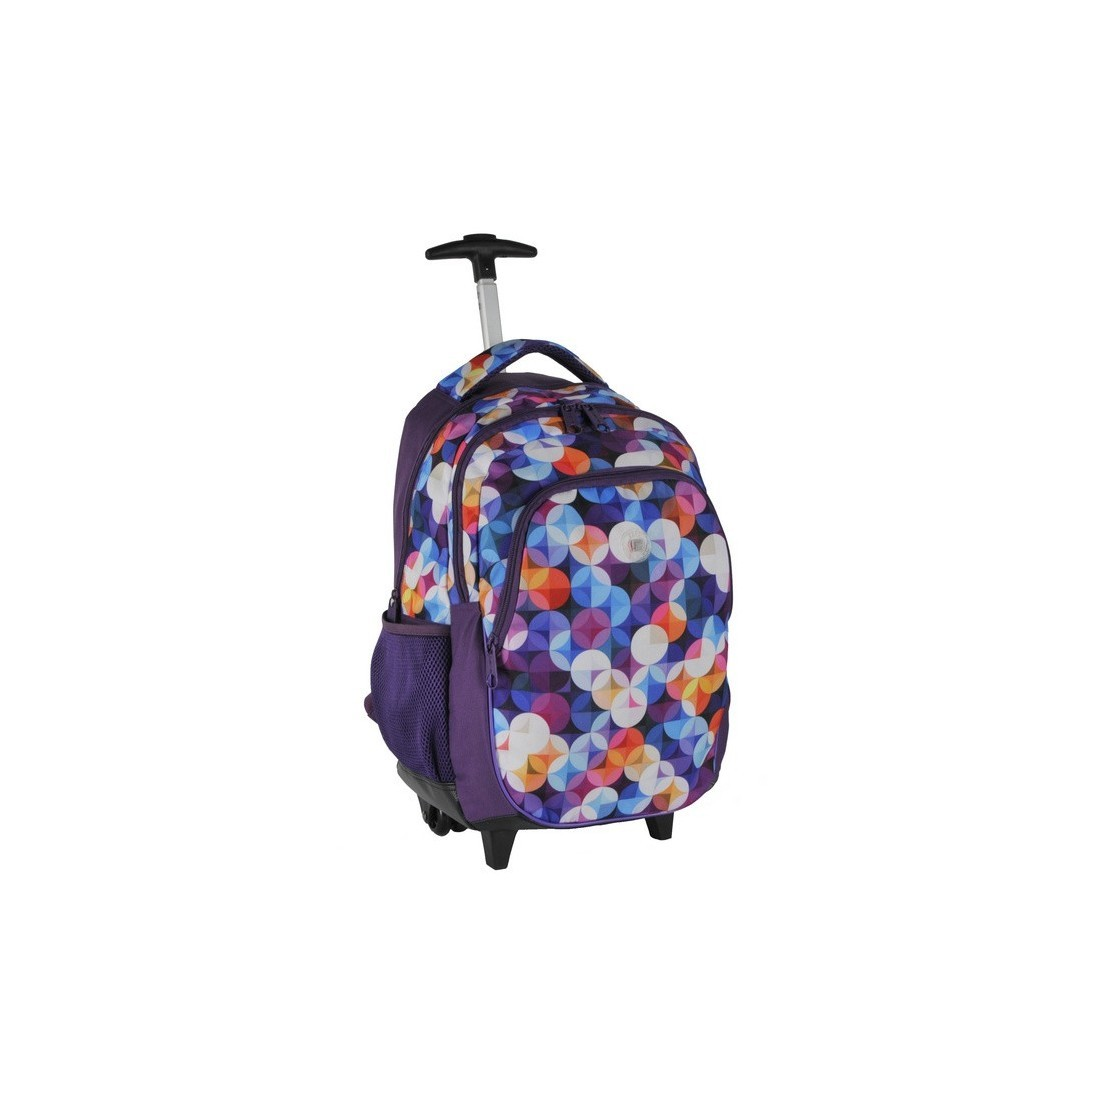 Plecak na kółkach w kolorowe kółka